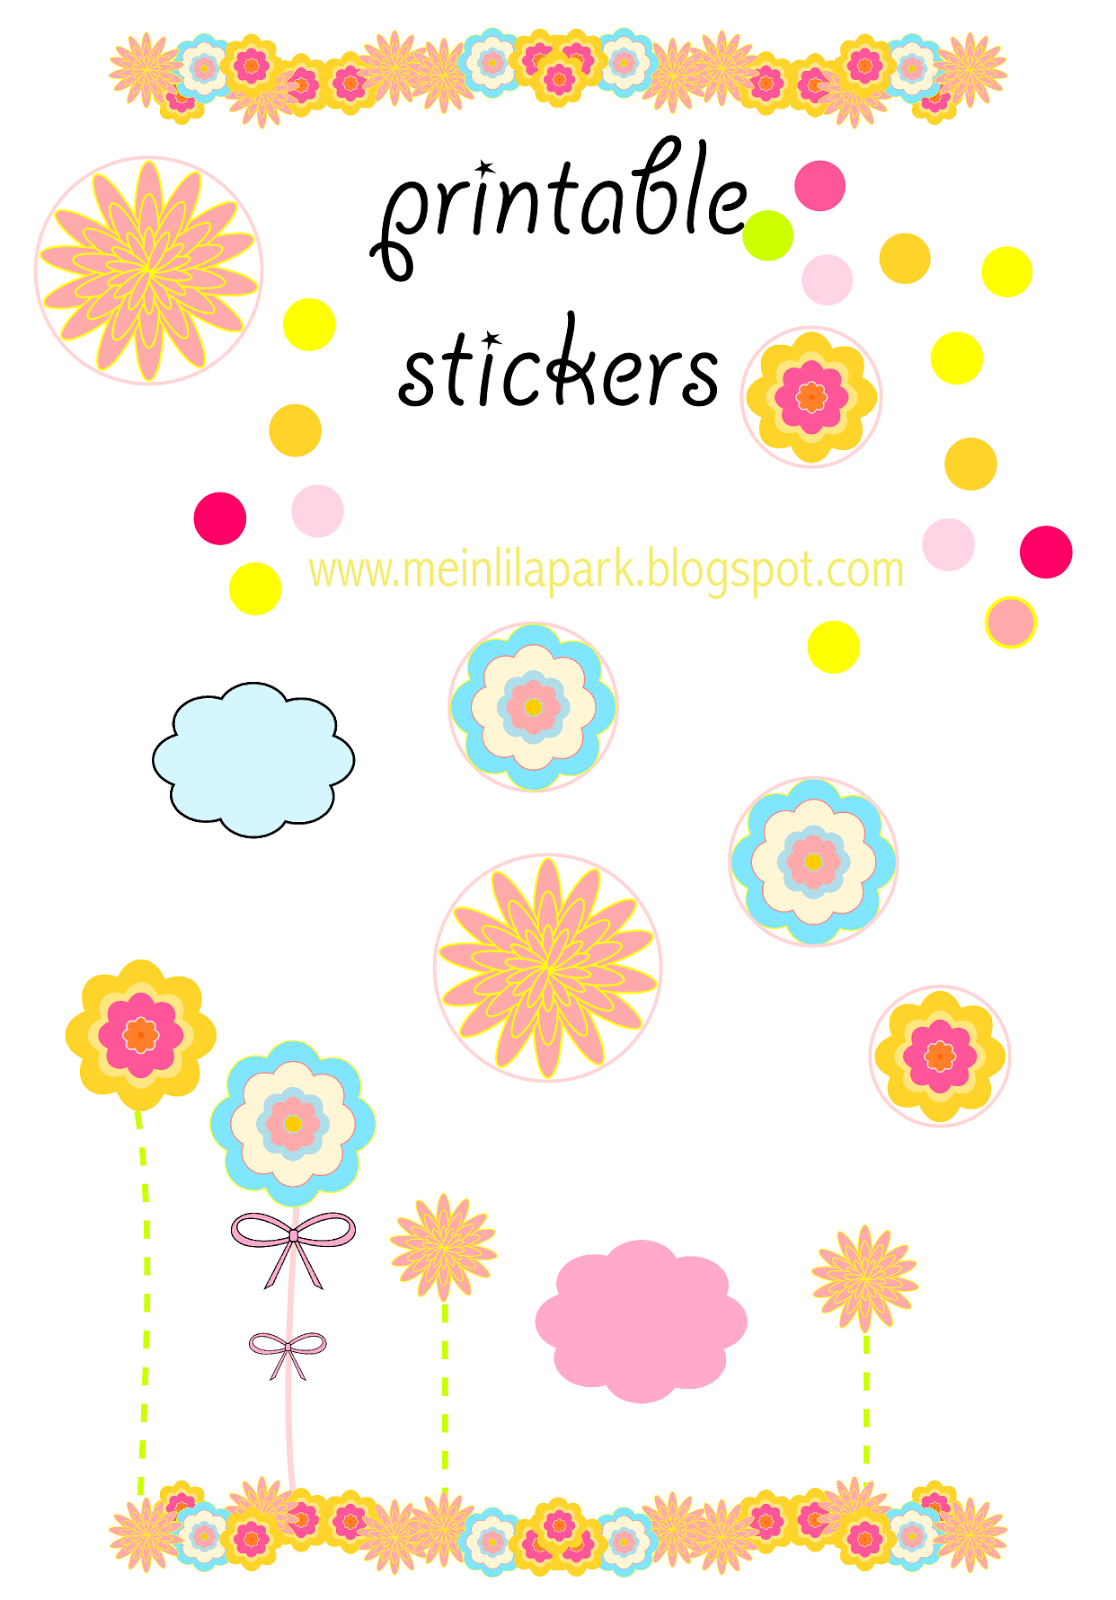 Free Printable Sticker Templates